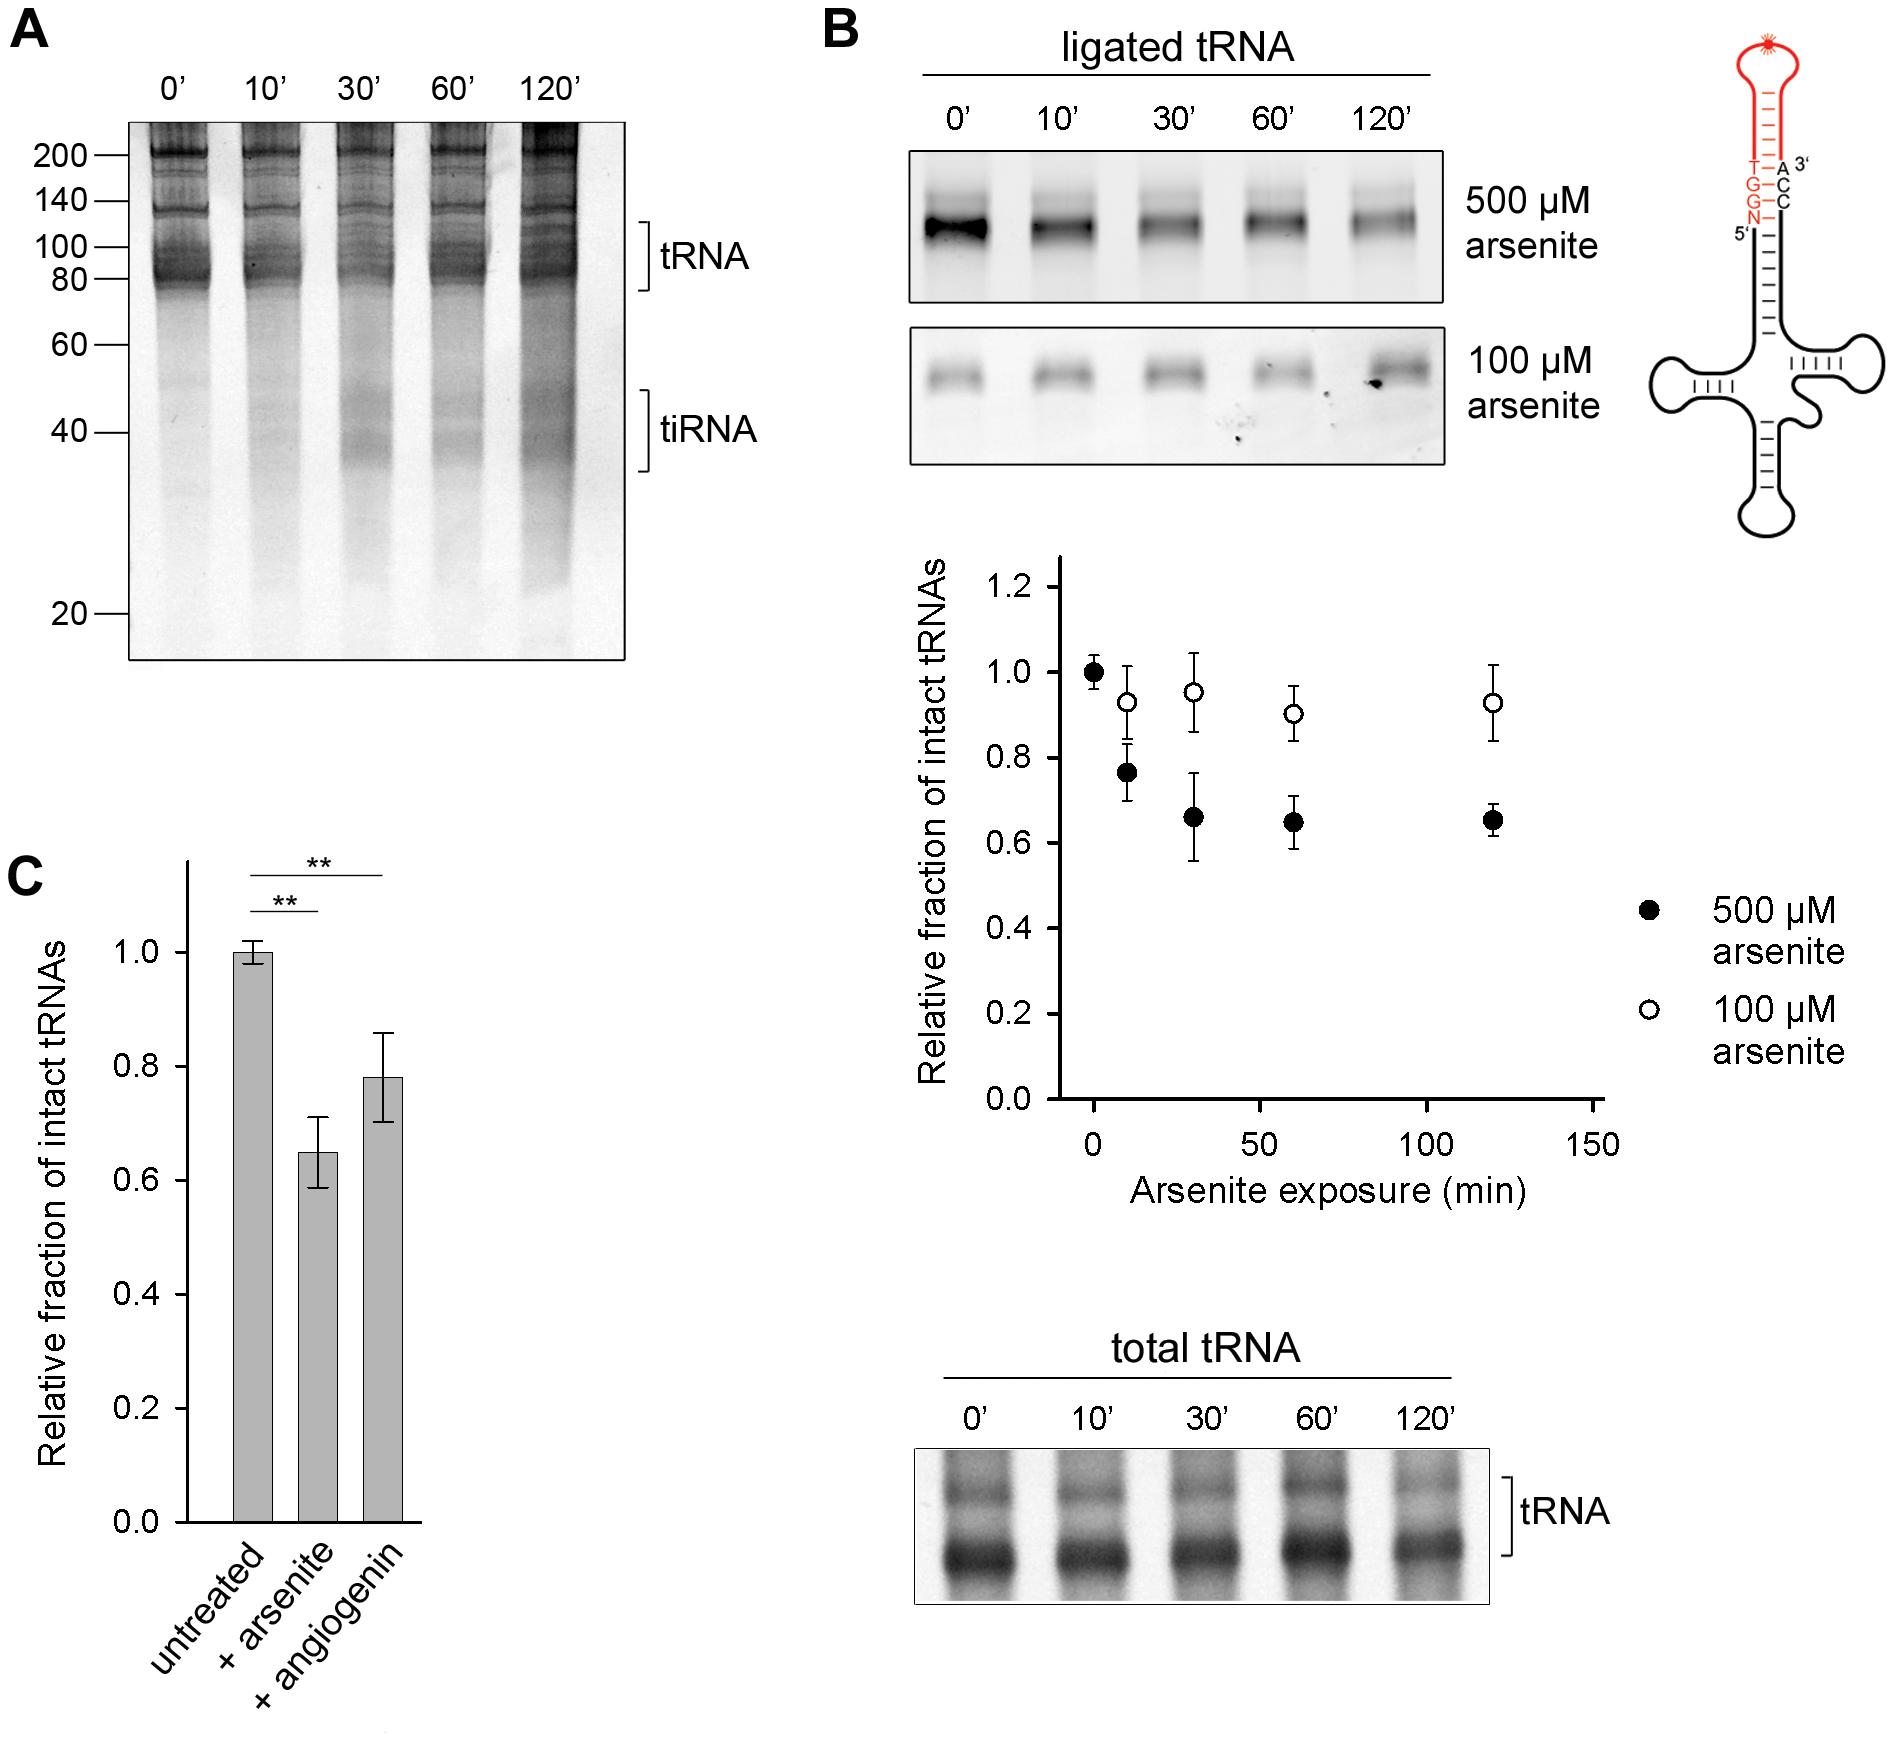 Oxidative stress-mediated tRNA cleavage in HeLa cells.